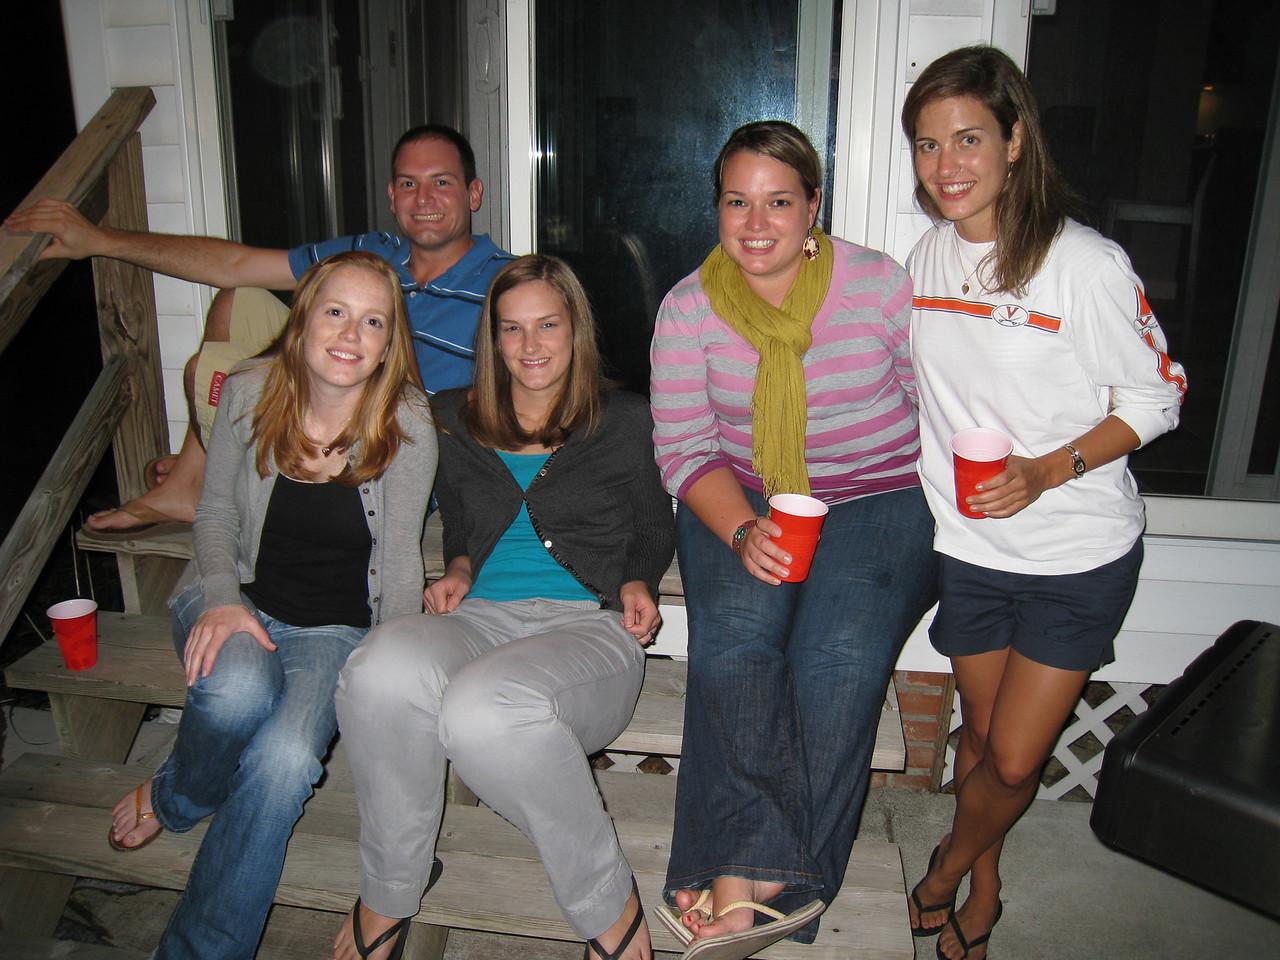 10/9/2009 - Friday Happy Hour - Lauren Tipton, Jon Deutsch, Jesse S, Jen Kelley, Jessica Smith